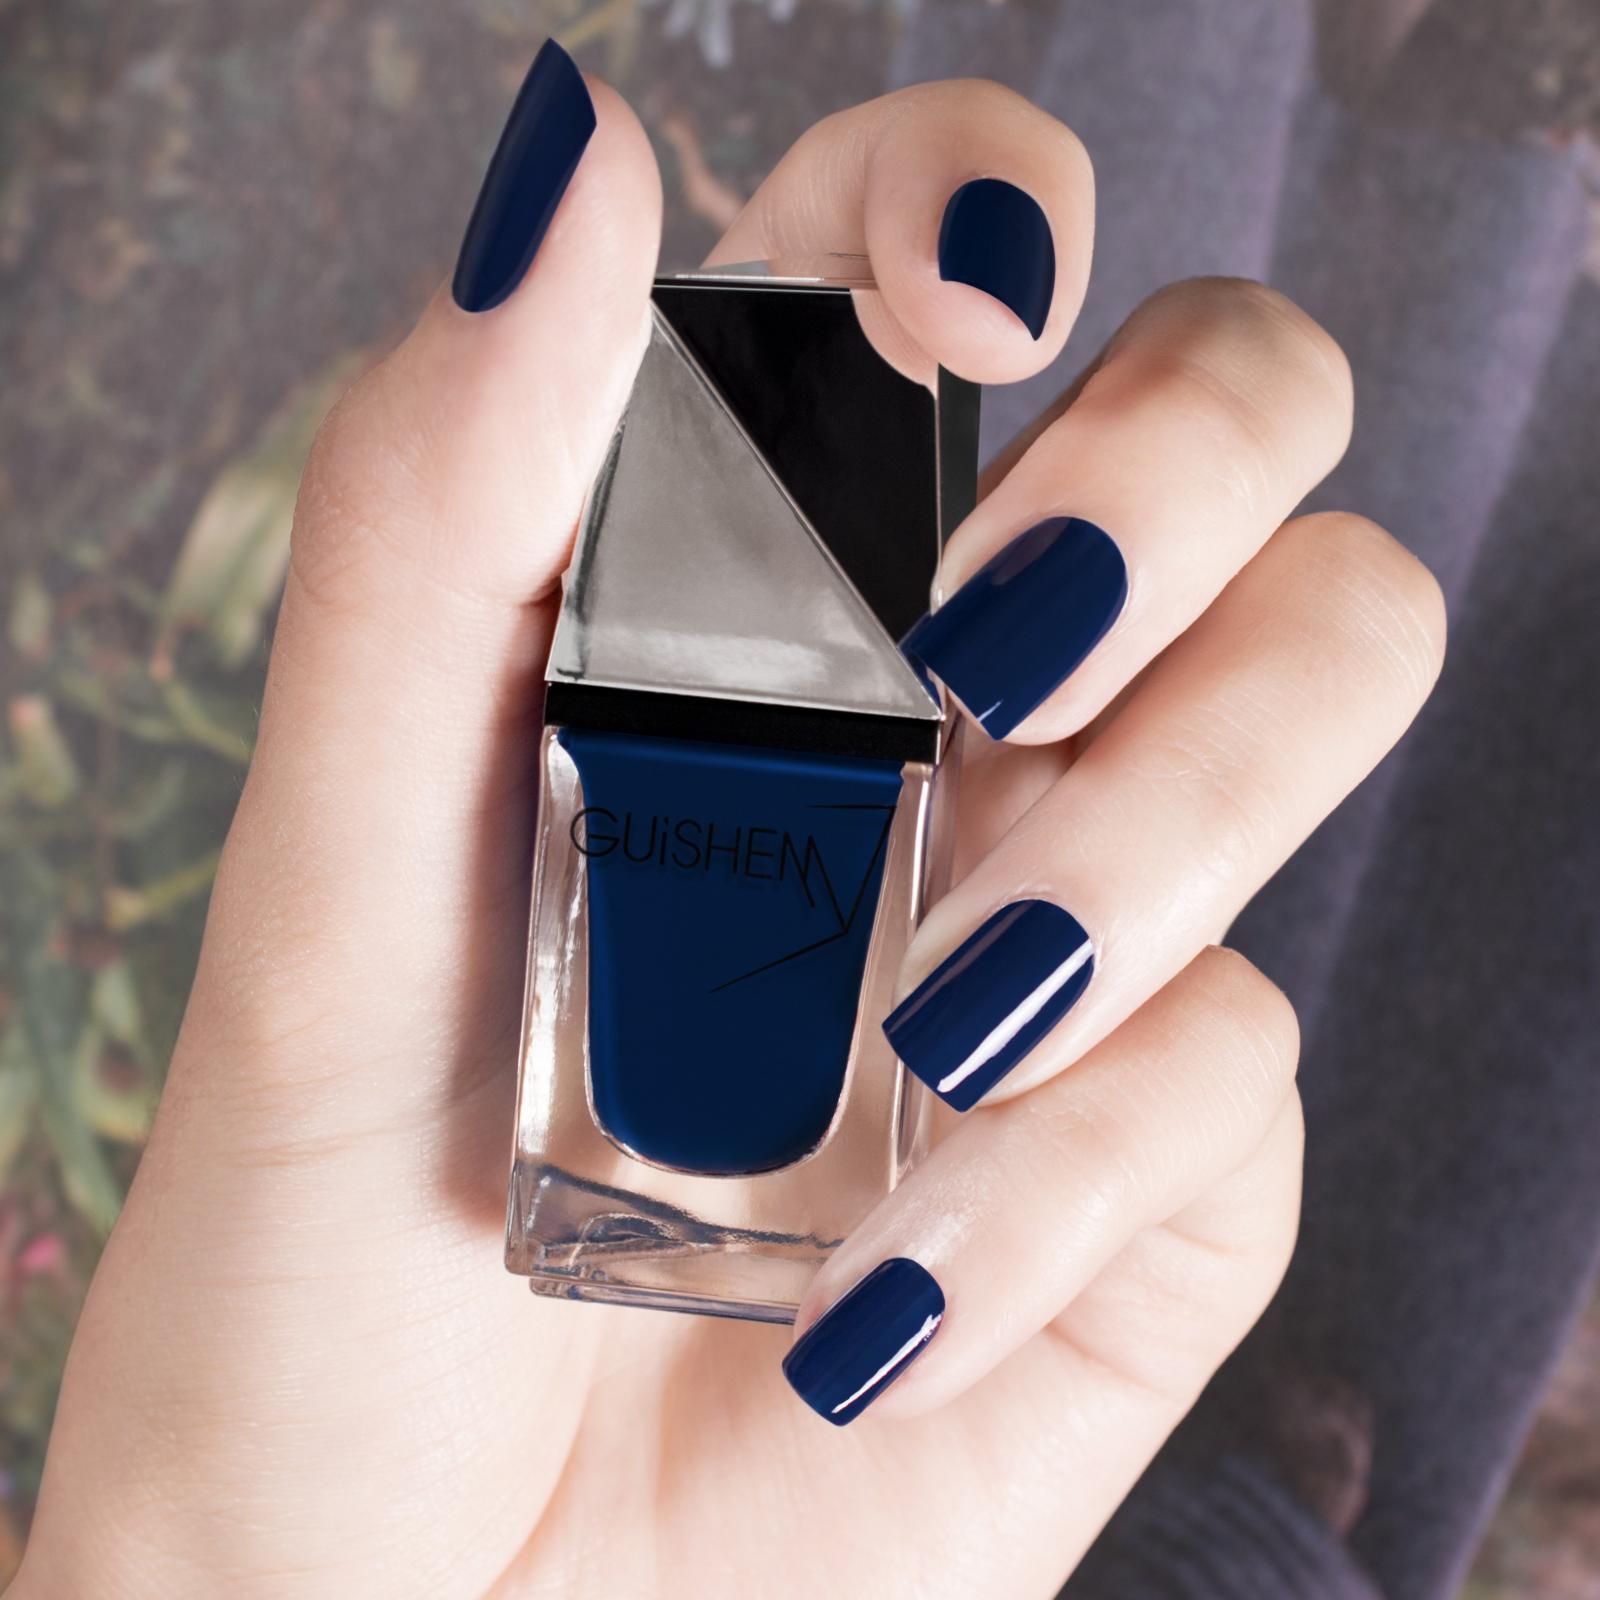 GUiSHEM Premium Nail Lacquer Crème Navy Blue, Azzurro - 091